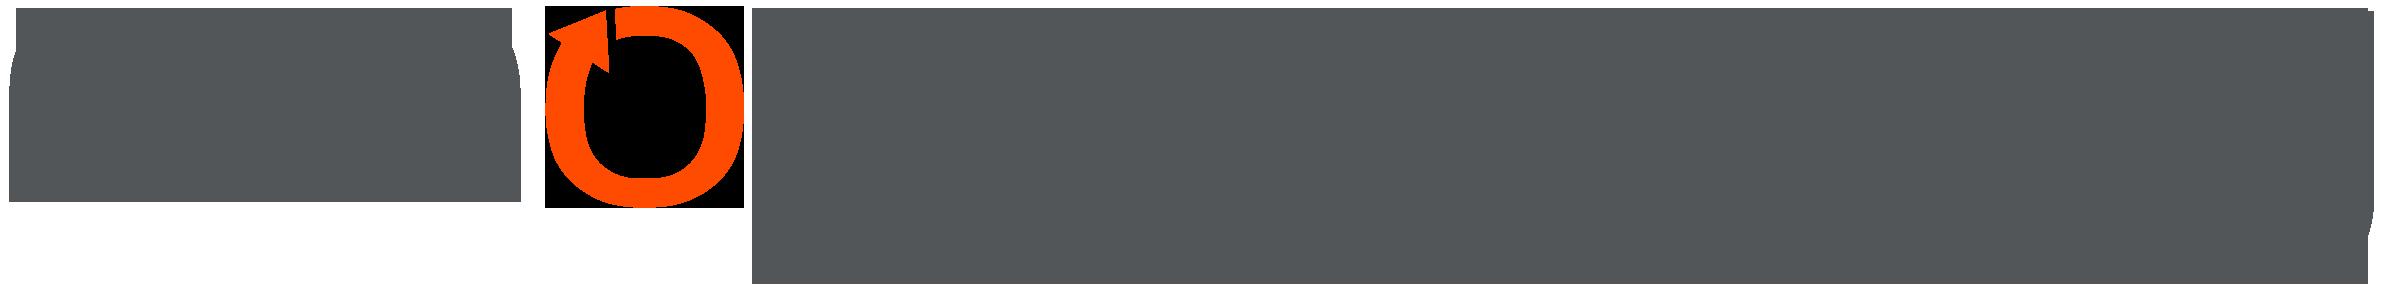 Renova Energy logo